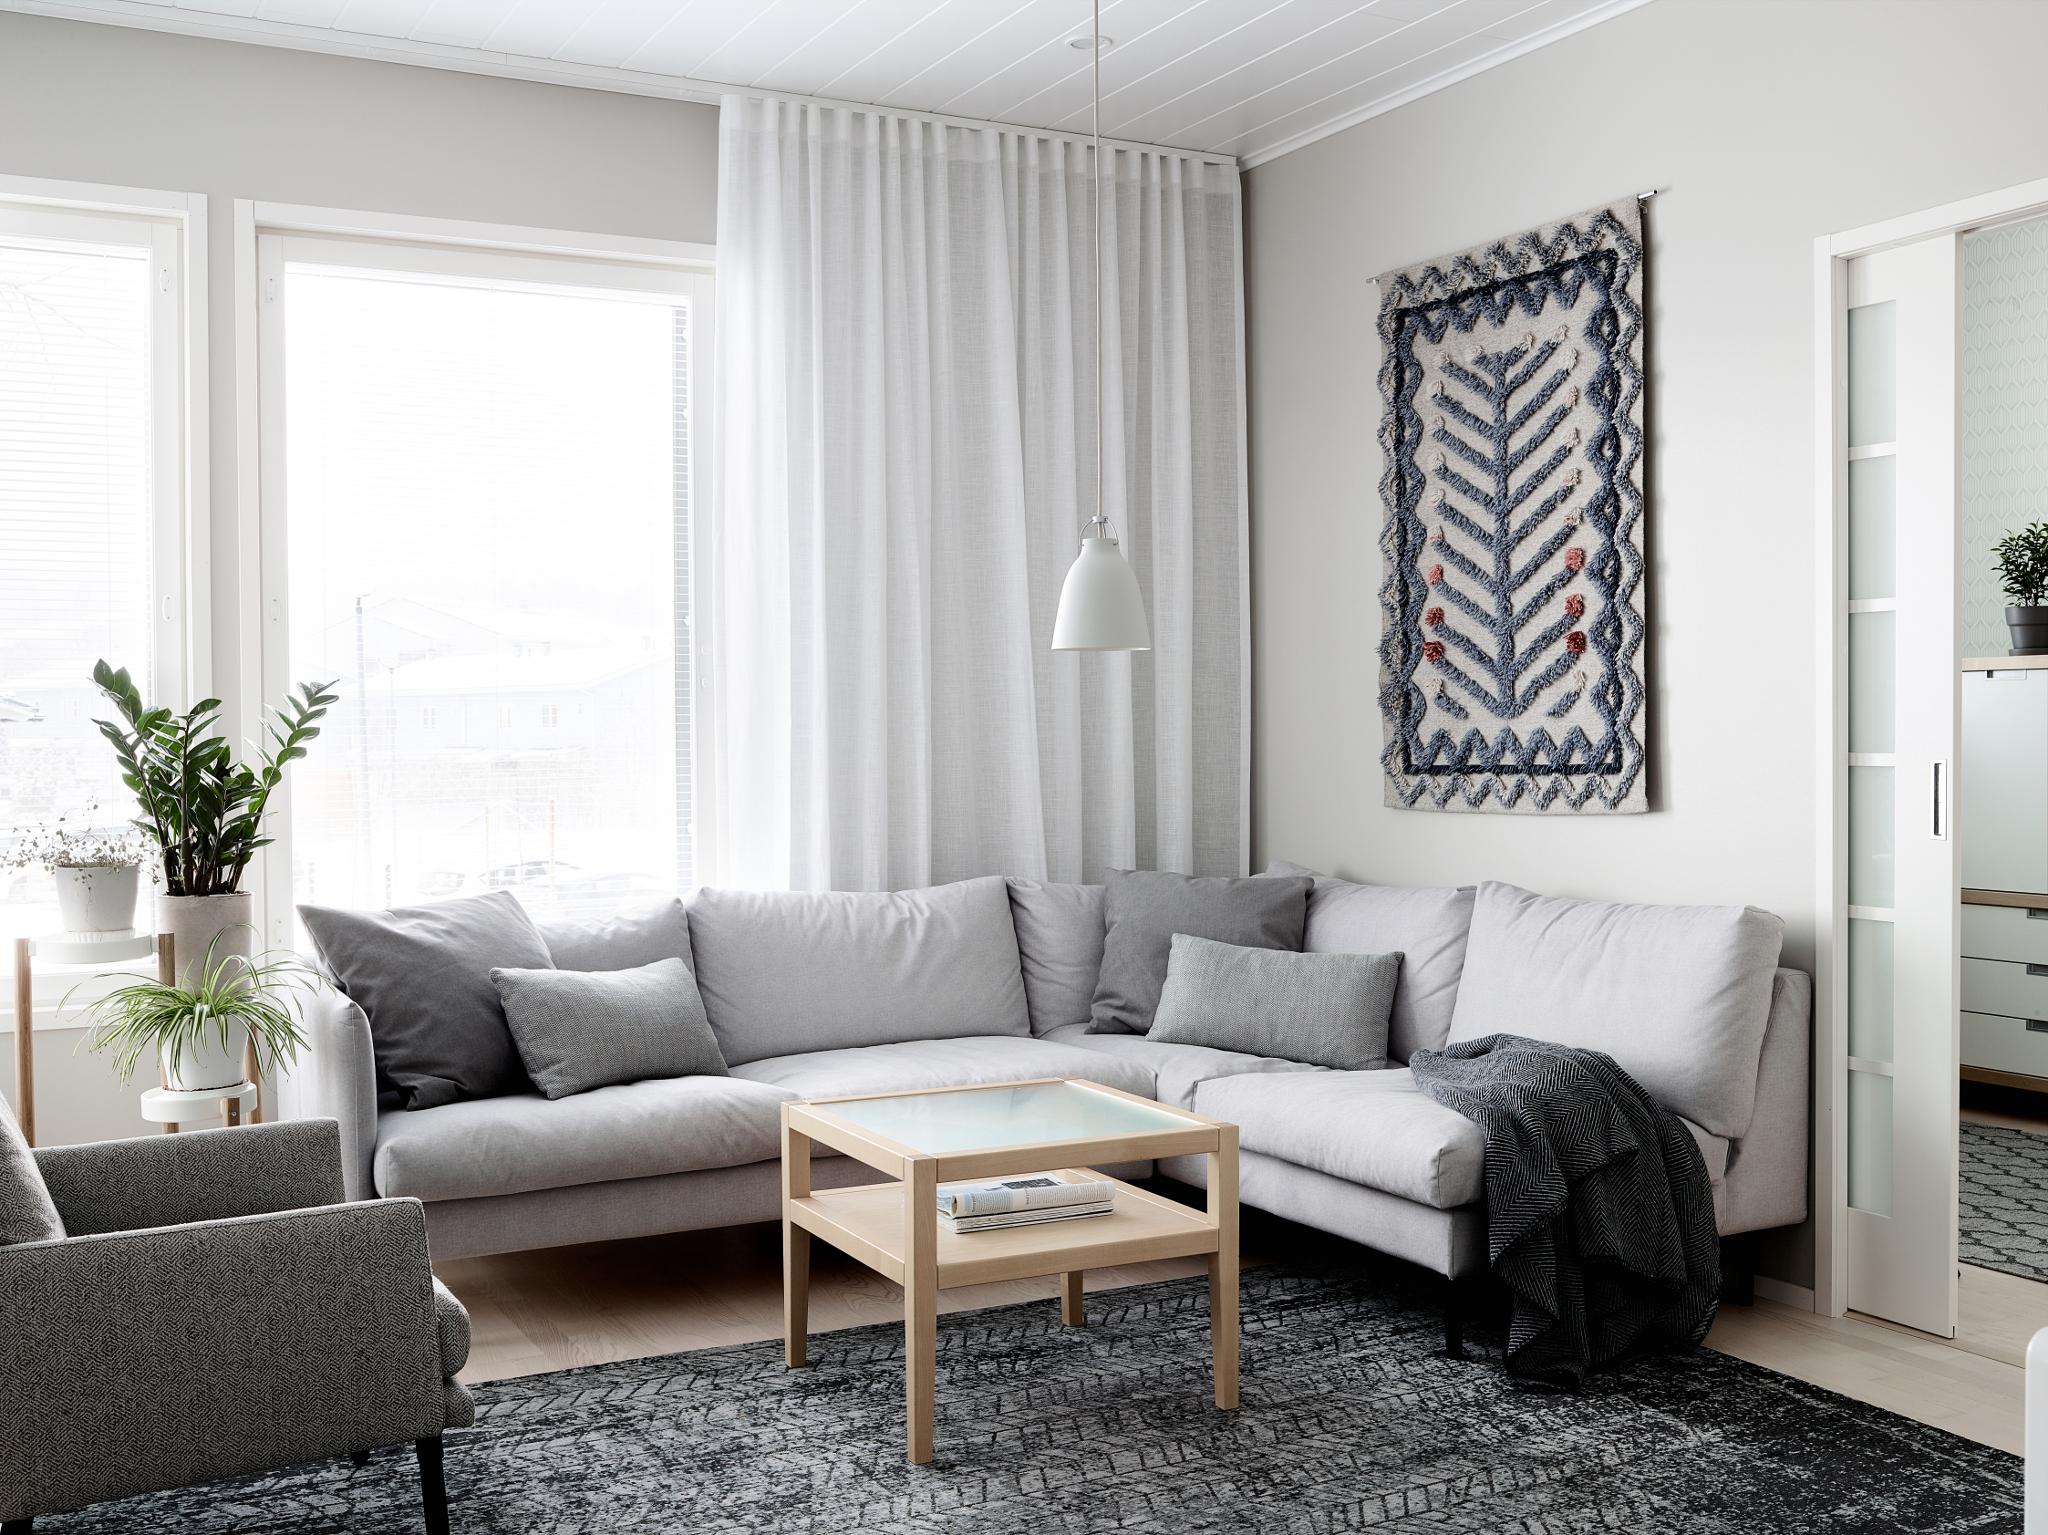 interior-anna-koponen-photo-krista-keltanen-01.jpg